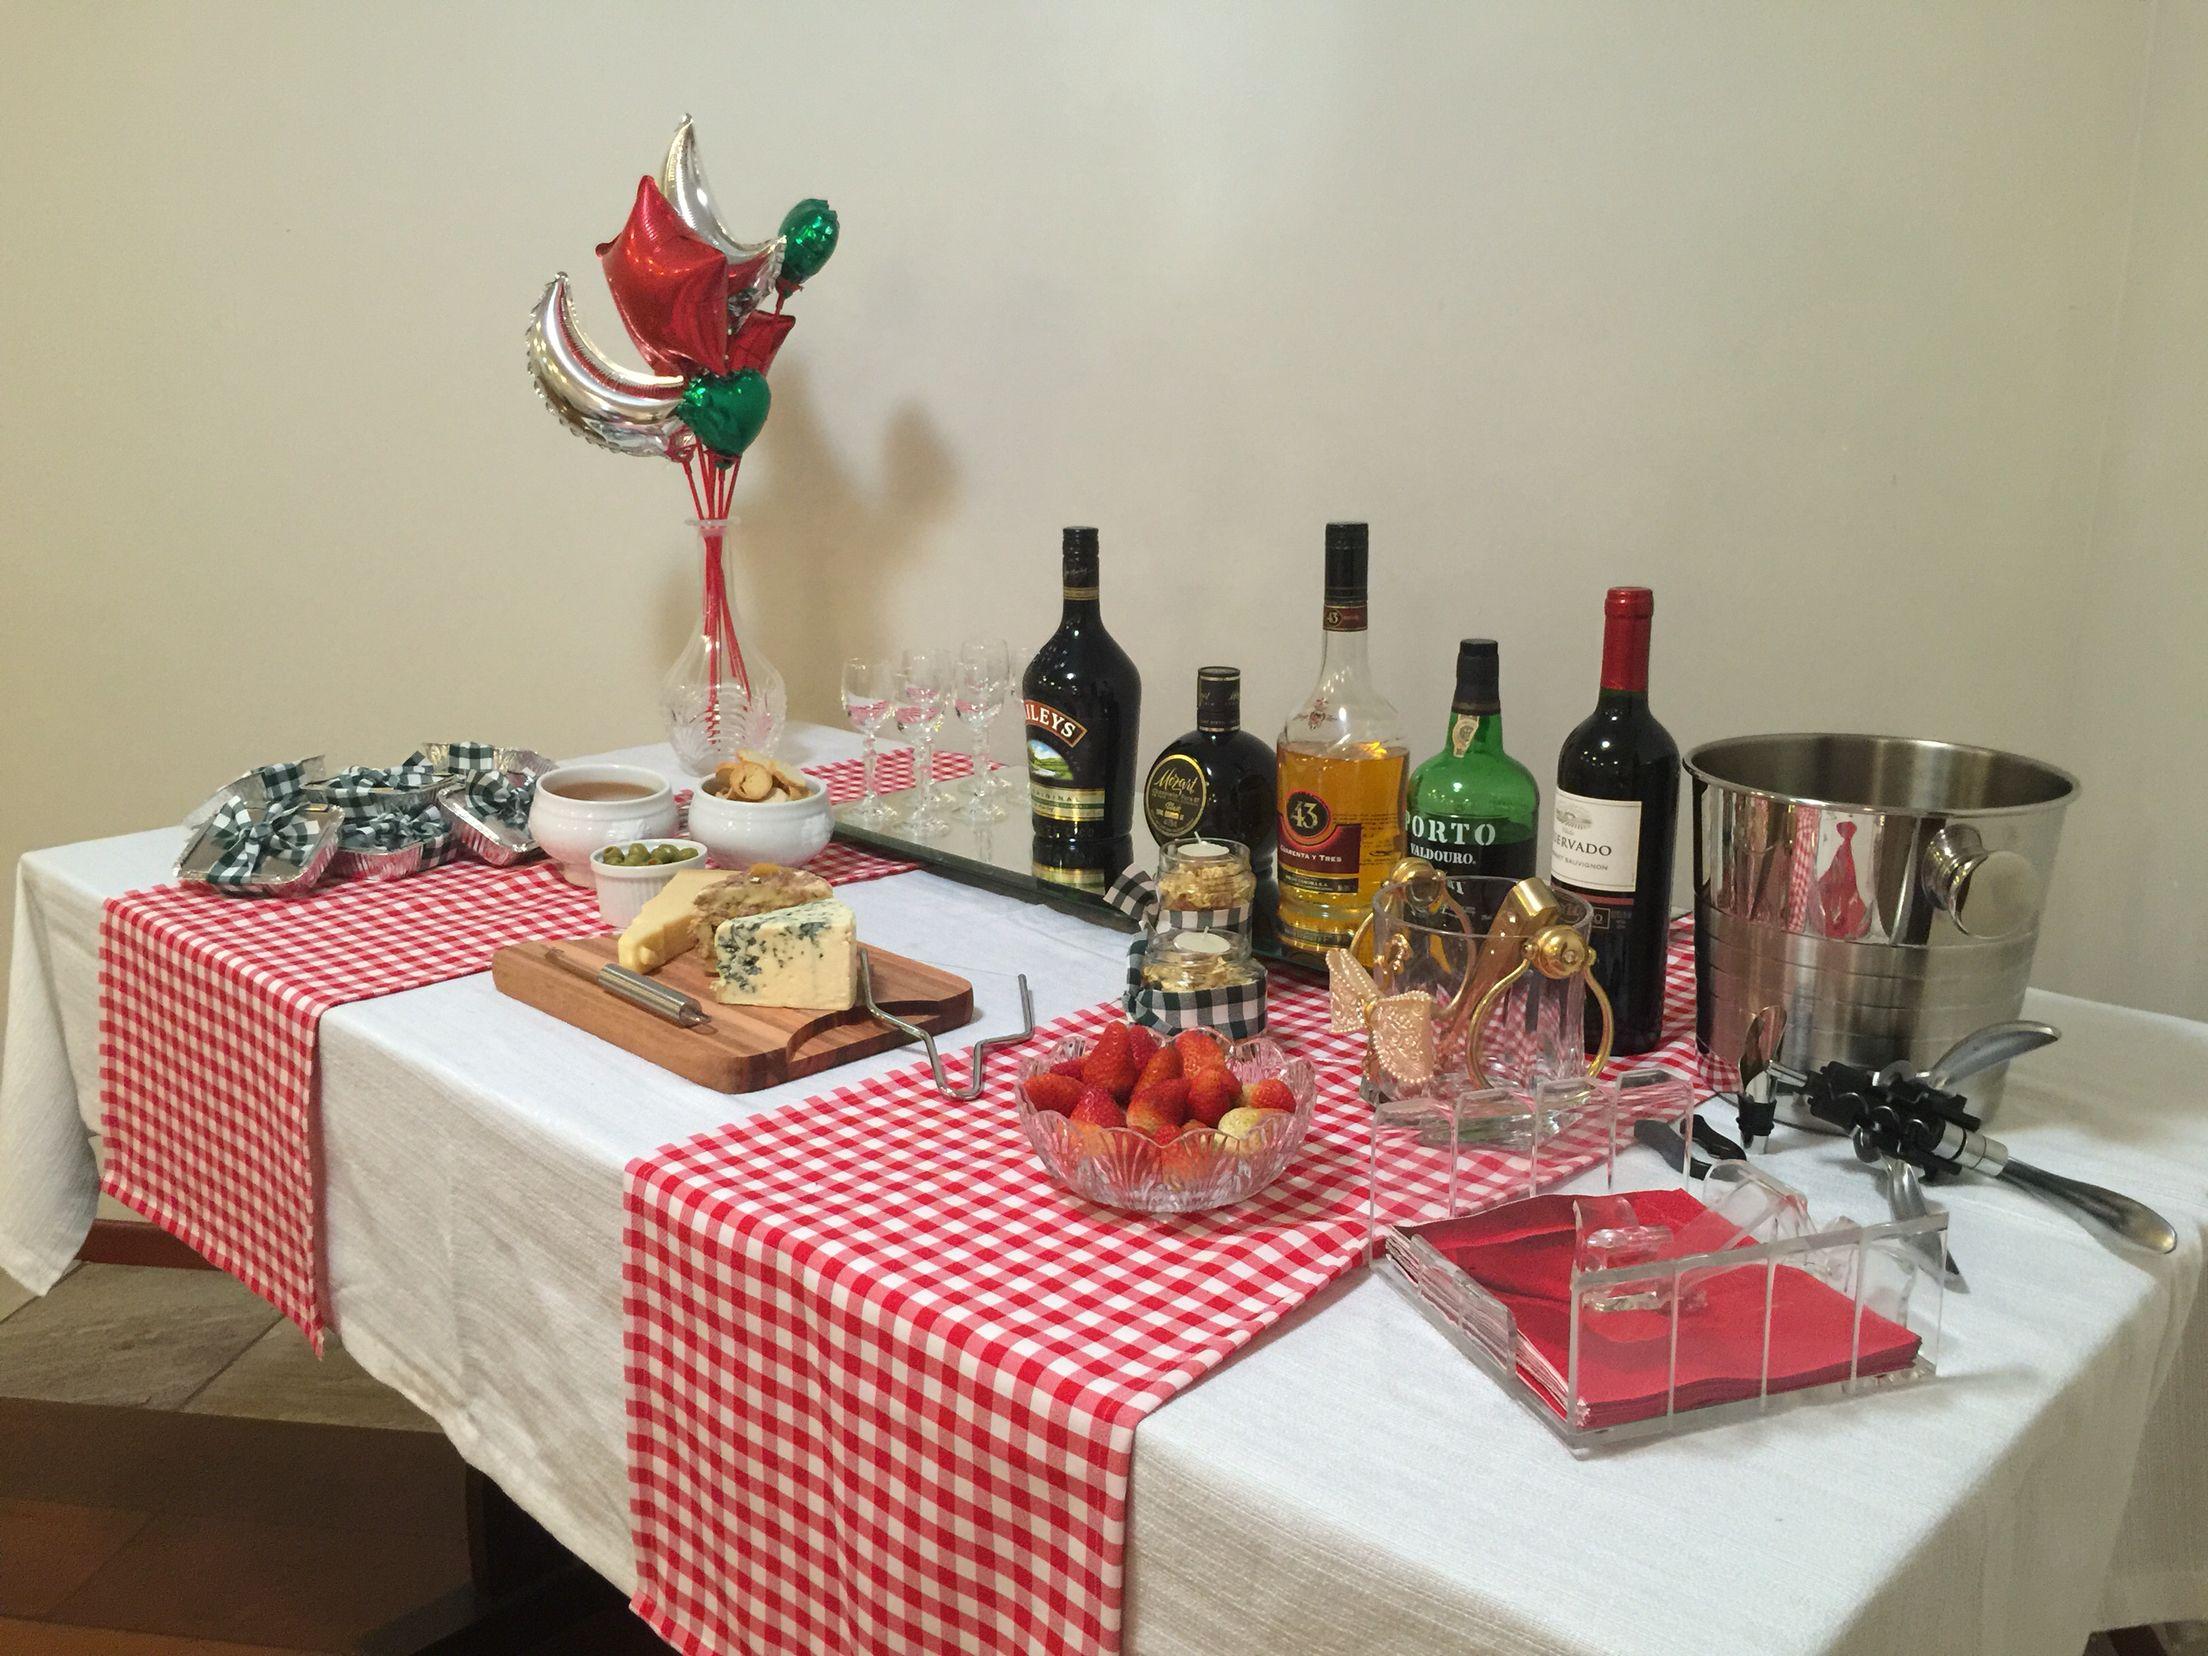 Decora o italiana mesa das bebidas mi cumplea os for Decoracion italiana